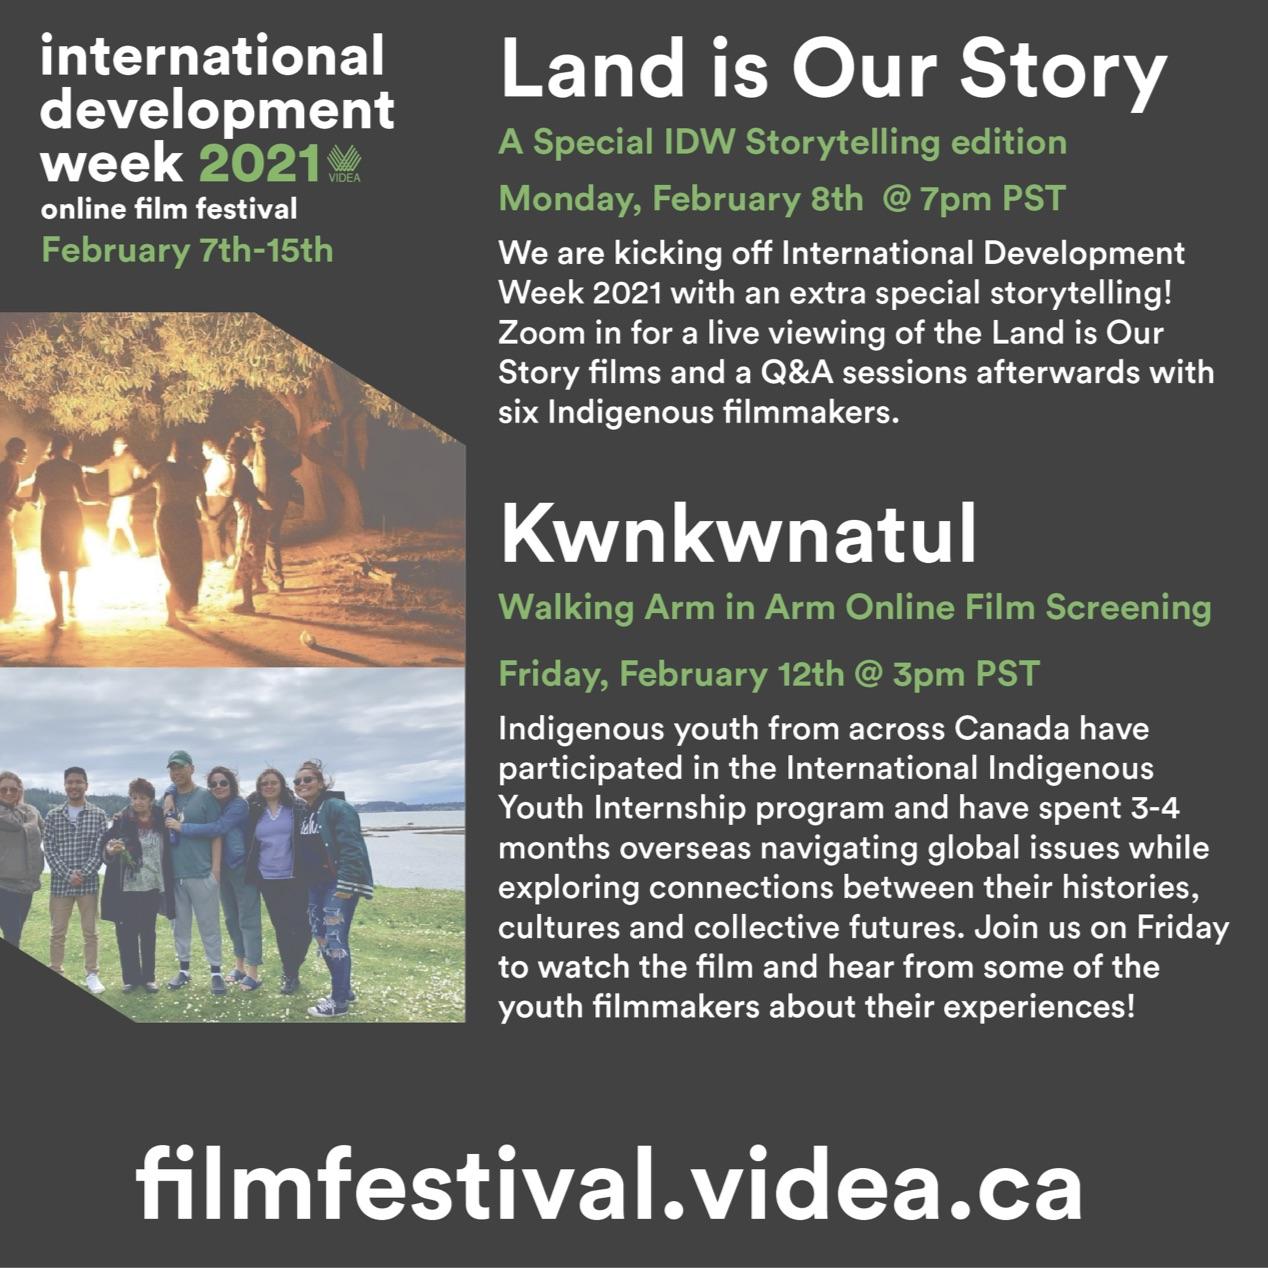 Poster for VIDEA's International Development Week virtual Film Festival.